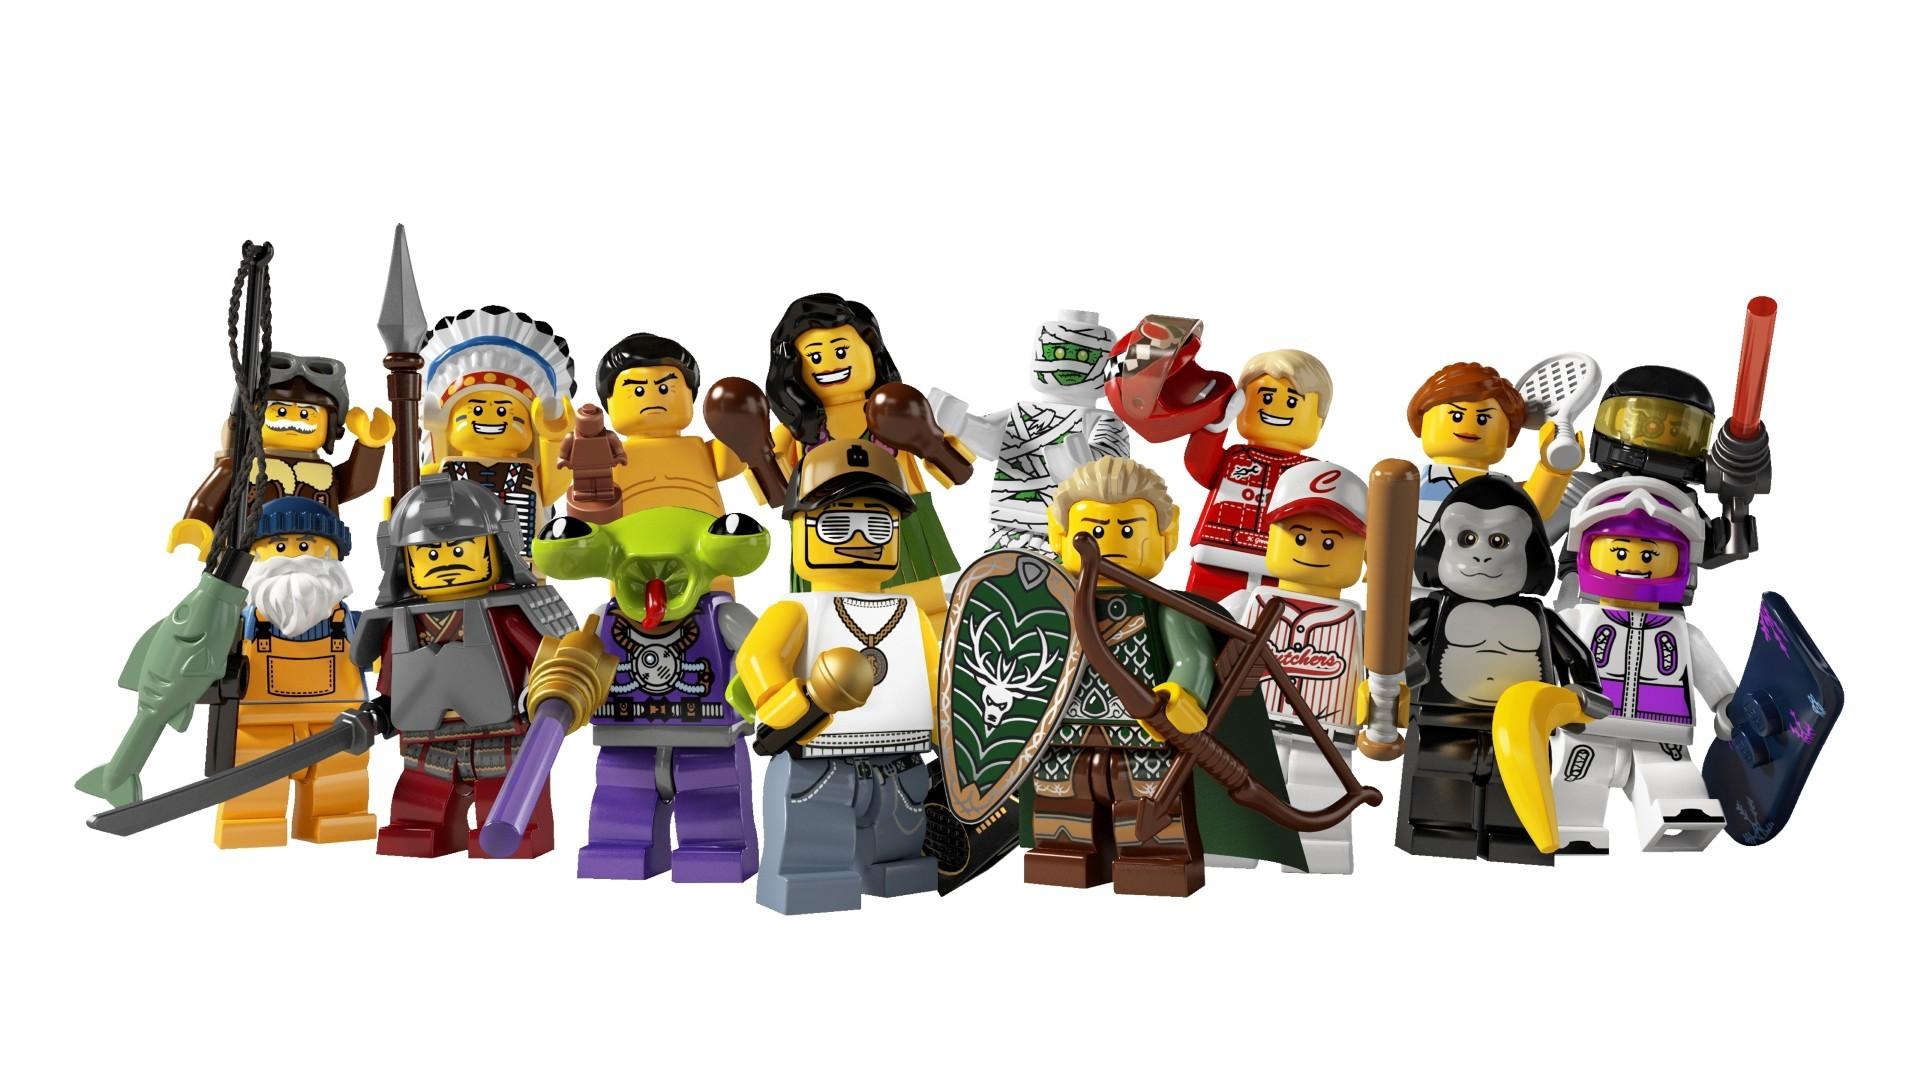 50+ LEGO Wallpaper for Kids Room on WallpaperSafari